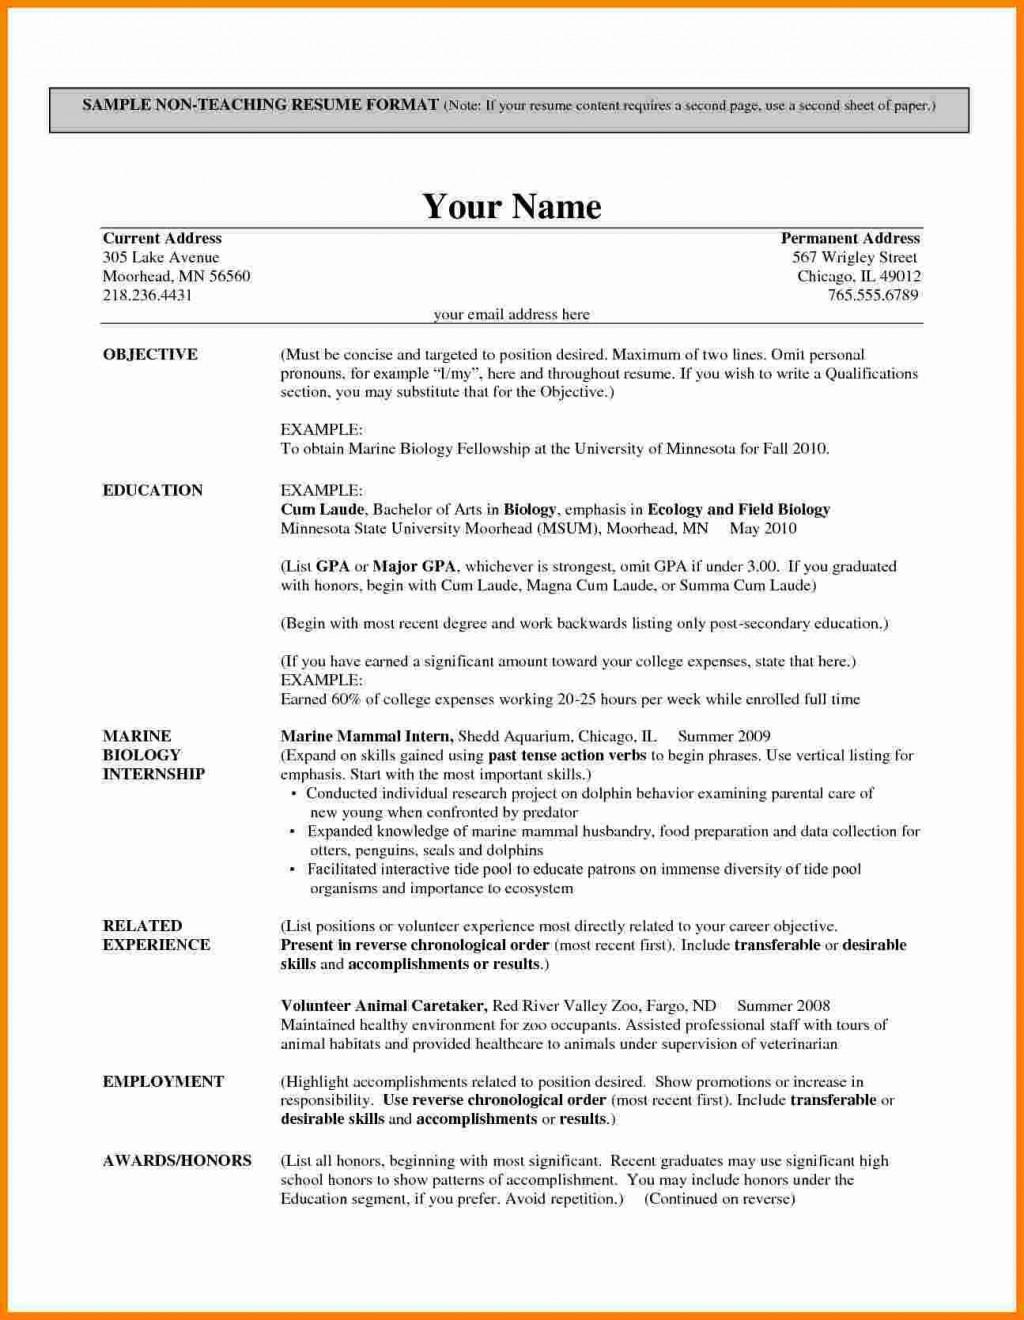 002 Shocking Resume Example For Teacher Job Picture  Sample Cv SchoolLarge